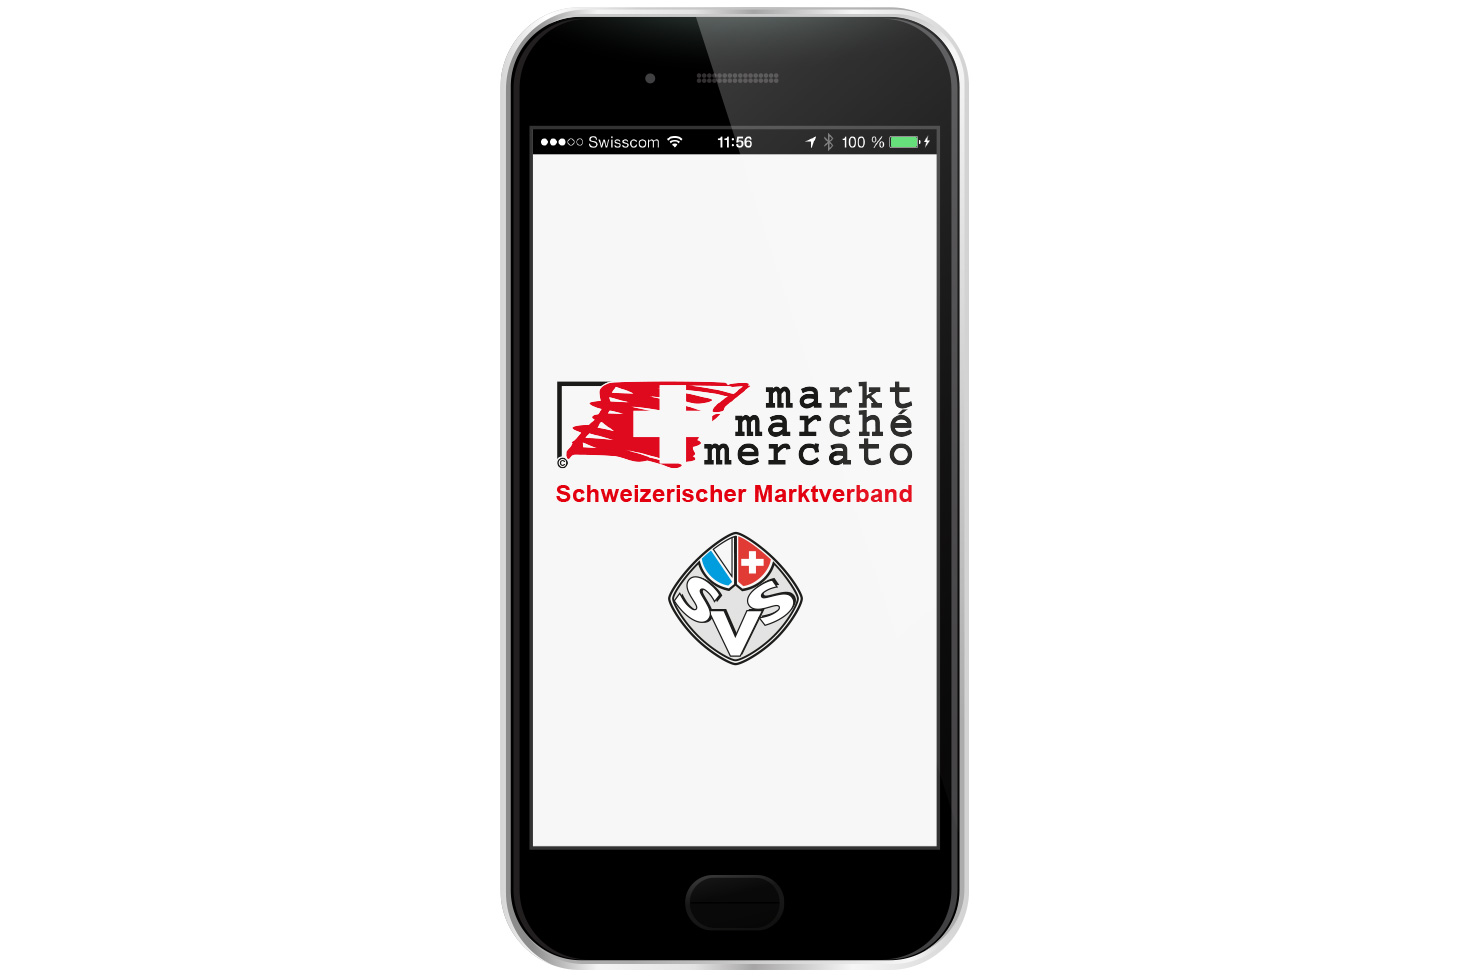 Bild 1 vom Marktkalender Mobile App